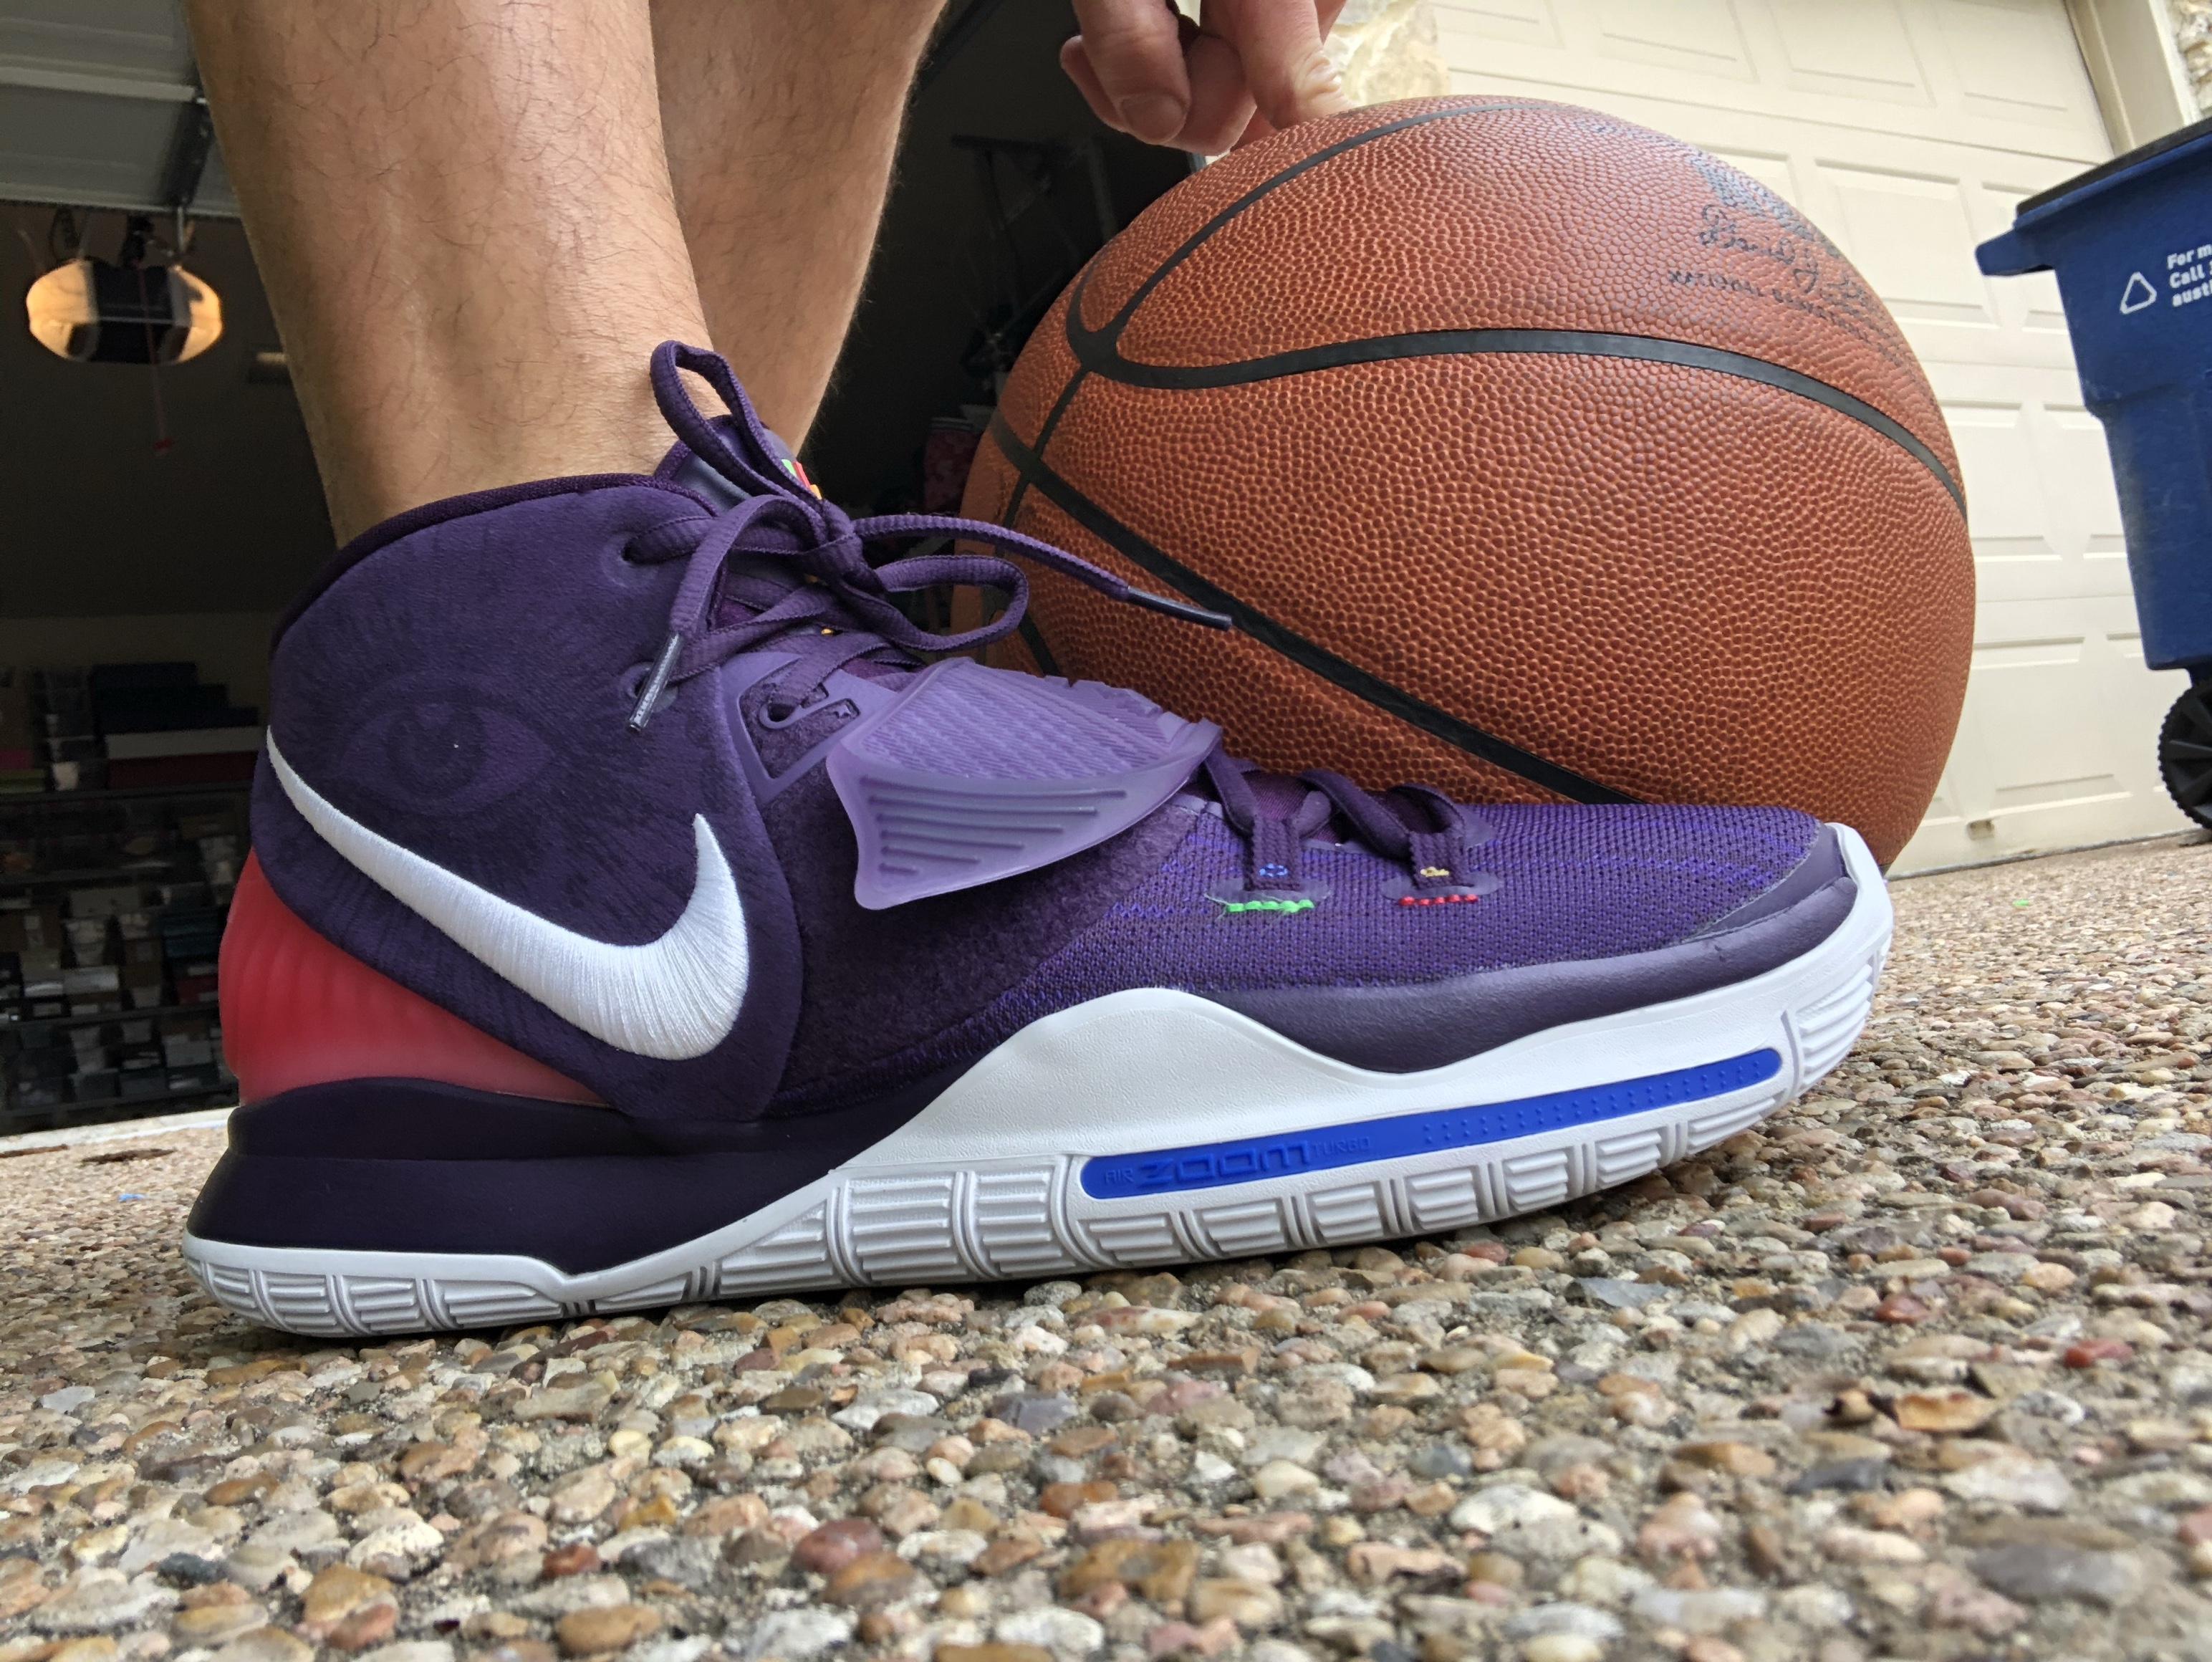 Nike Kyrie 6 Performance Analysis and